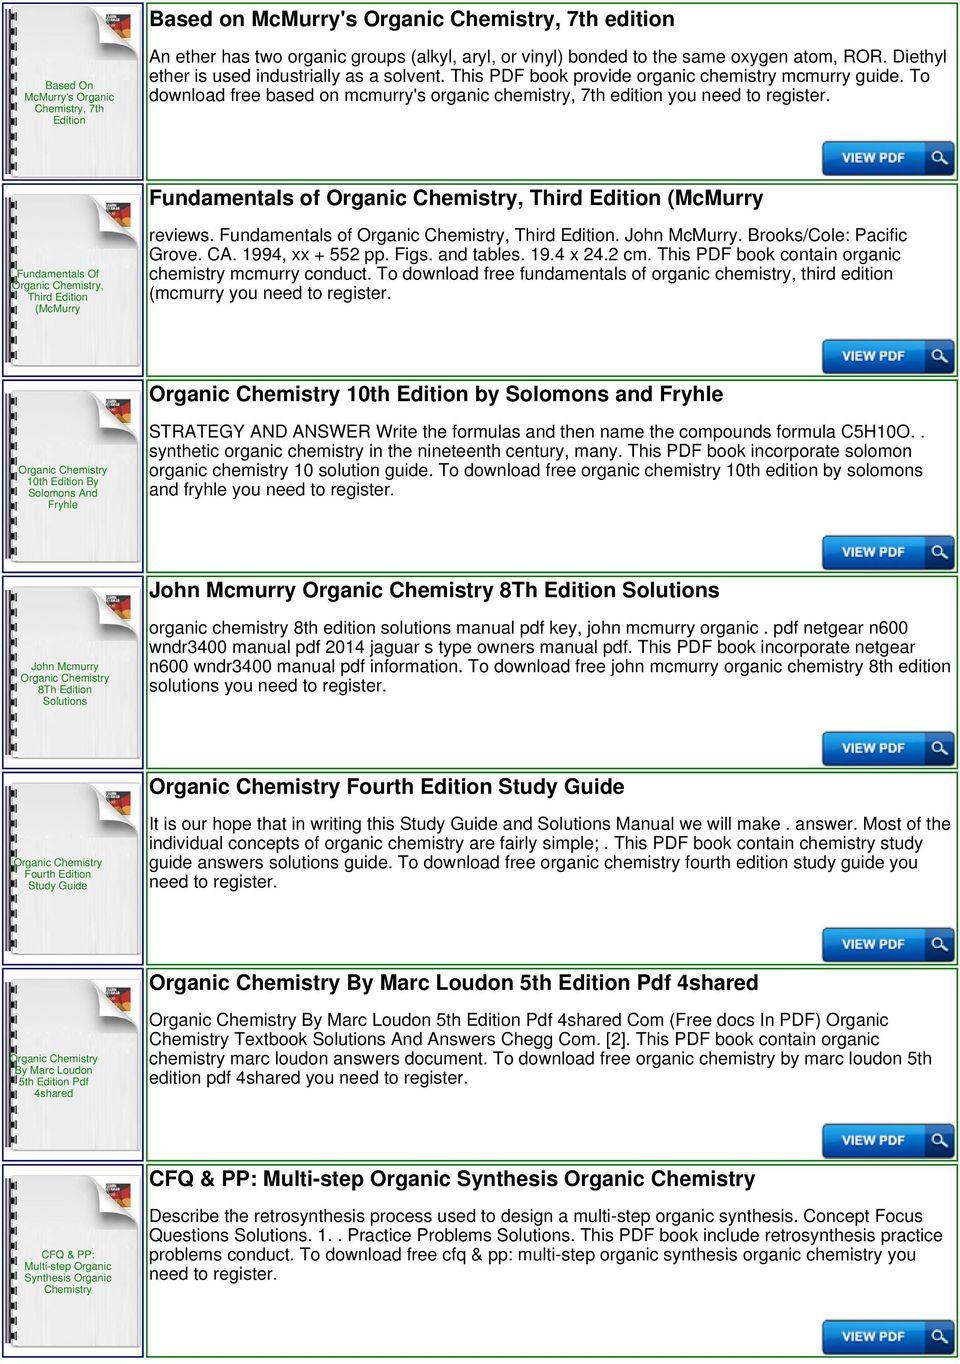 John Mcmurry Organic Chemistry 9th Edition Pdf